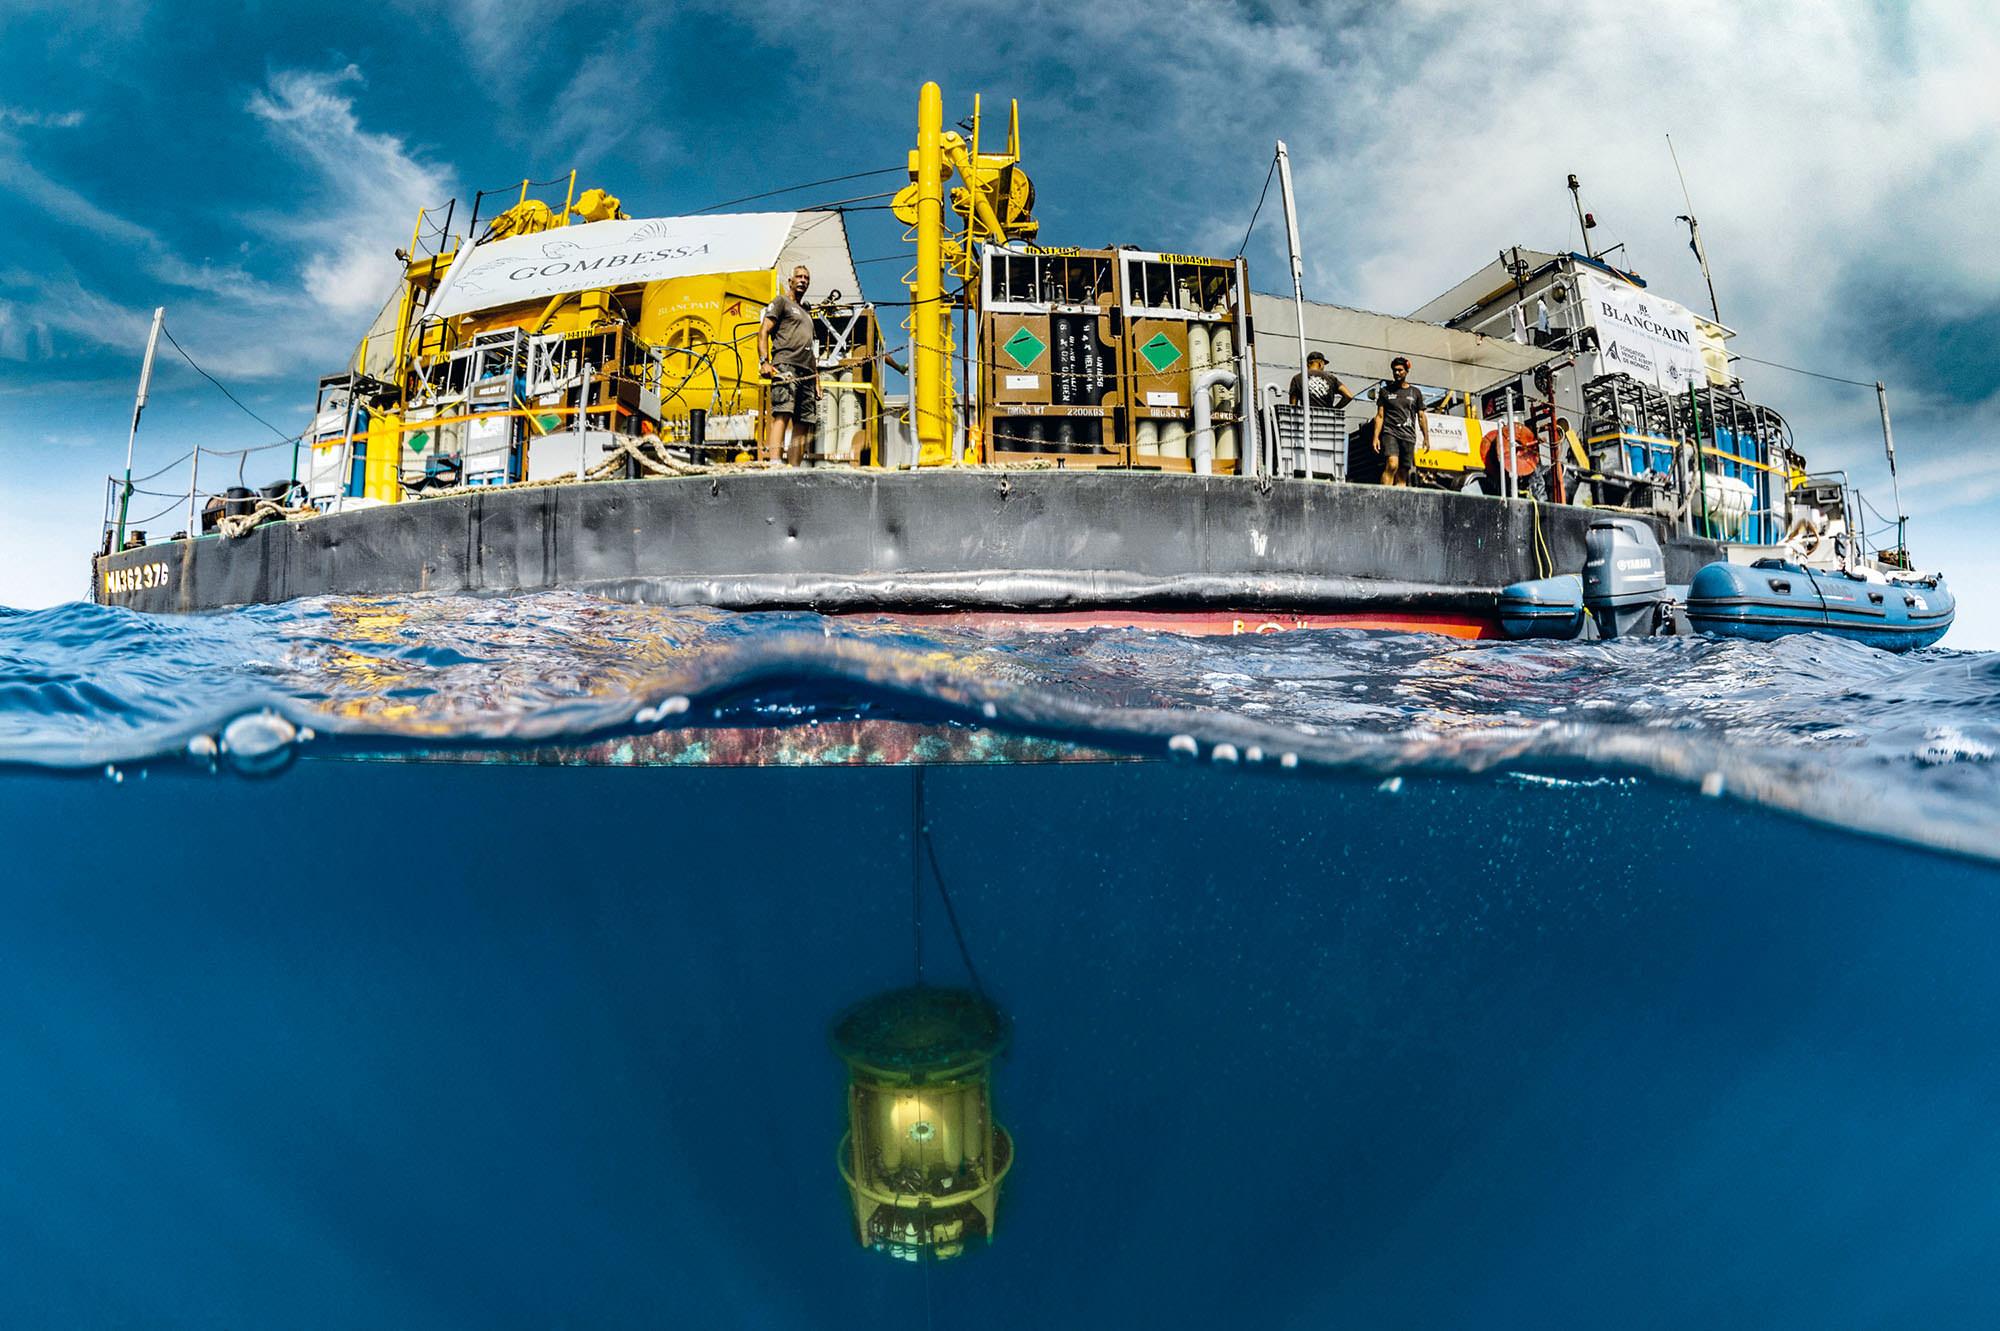 The Barge and immersed descent module Cjordi Chias Gombessa VI